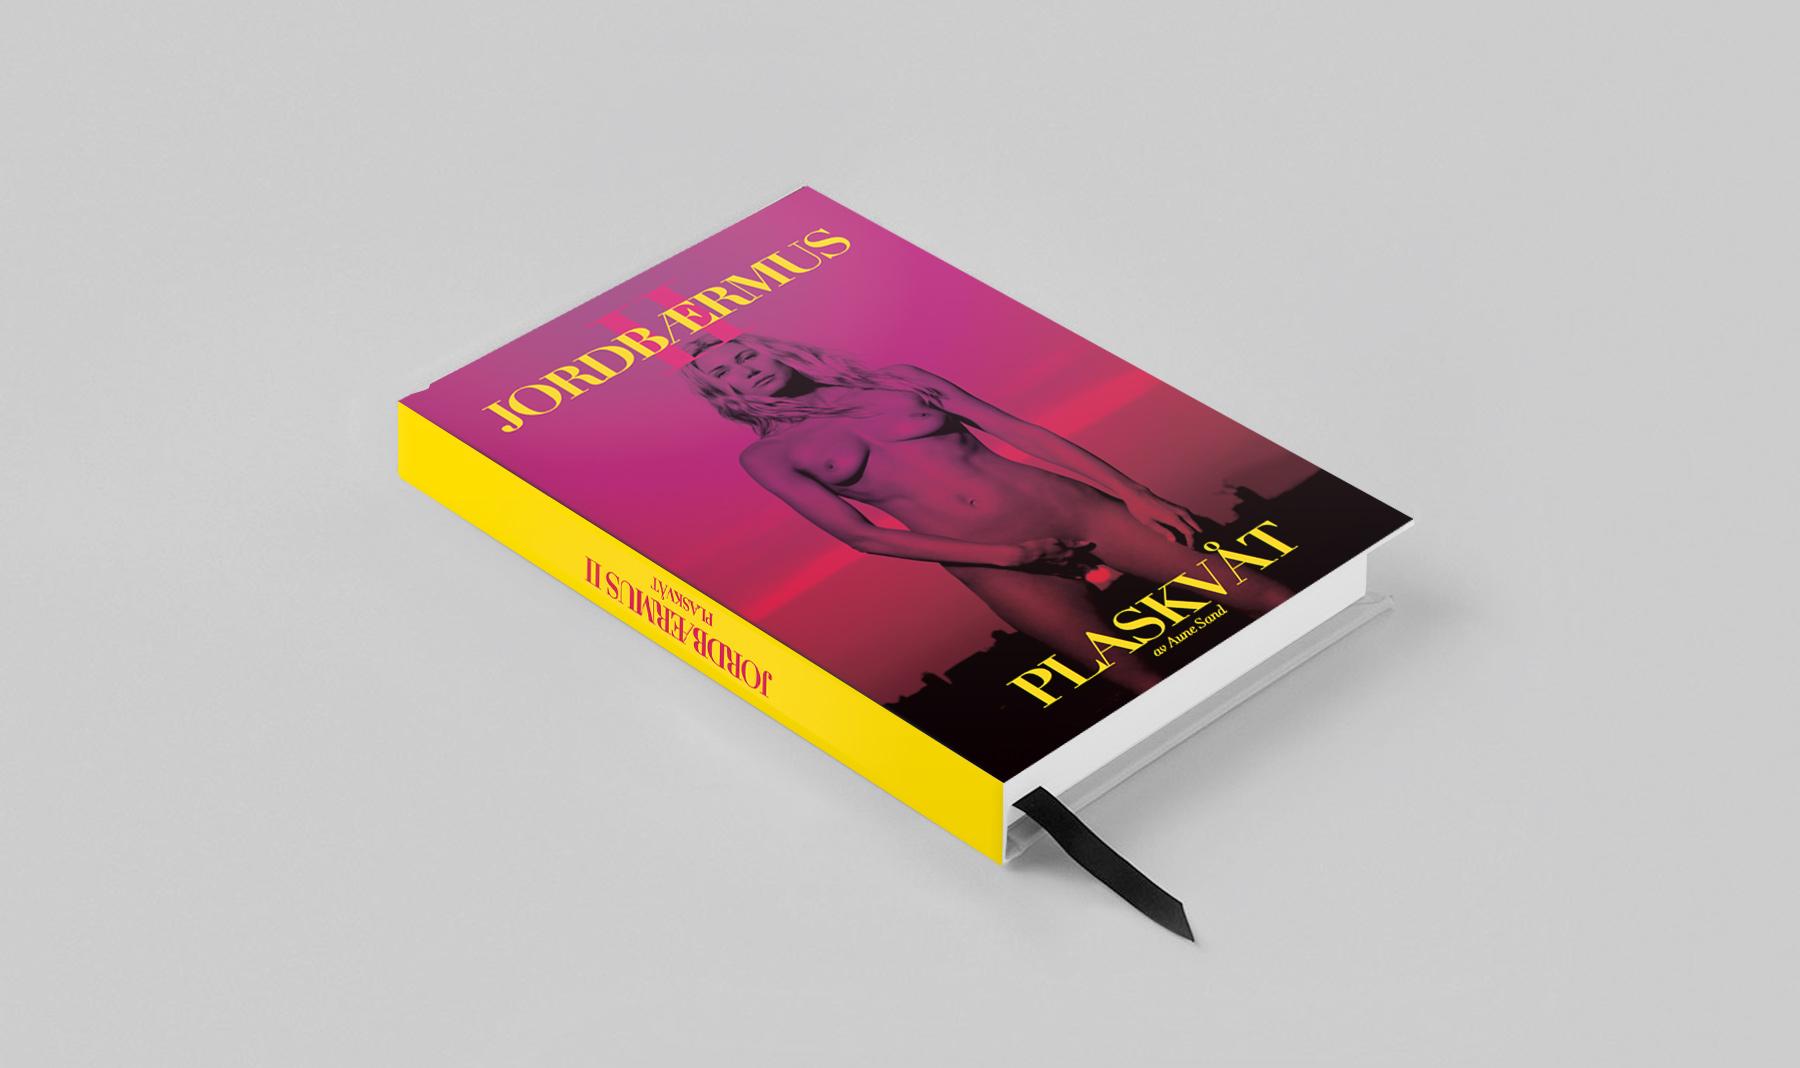 Jordbaermus II Aune Sand Book cover designed by 72dotsperinch